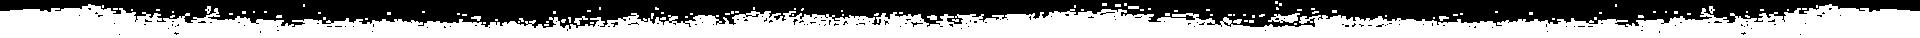 {{ brizy_dc_image_alt uid='wp-e884f5bb5ae678869a9b520c91f0a05b' }}